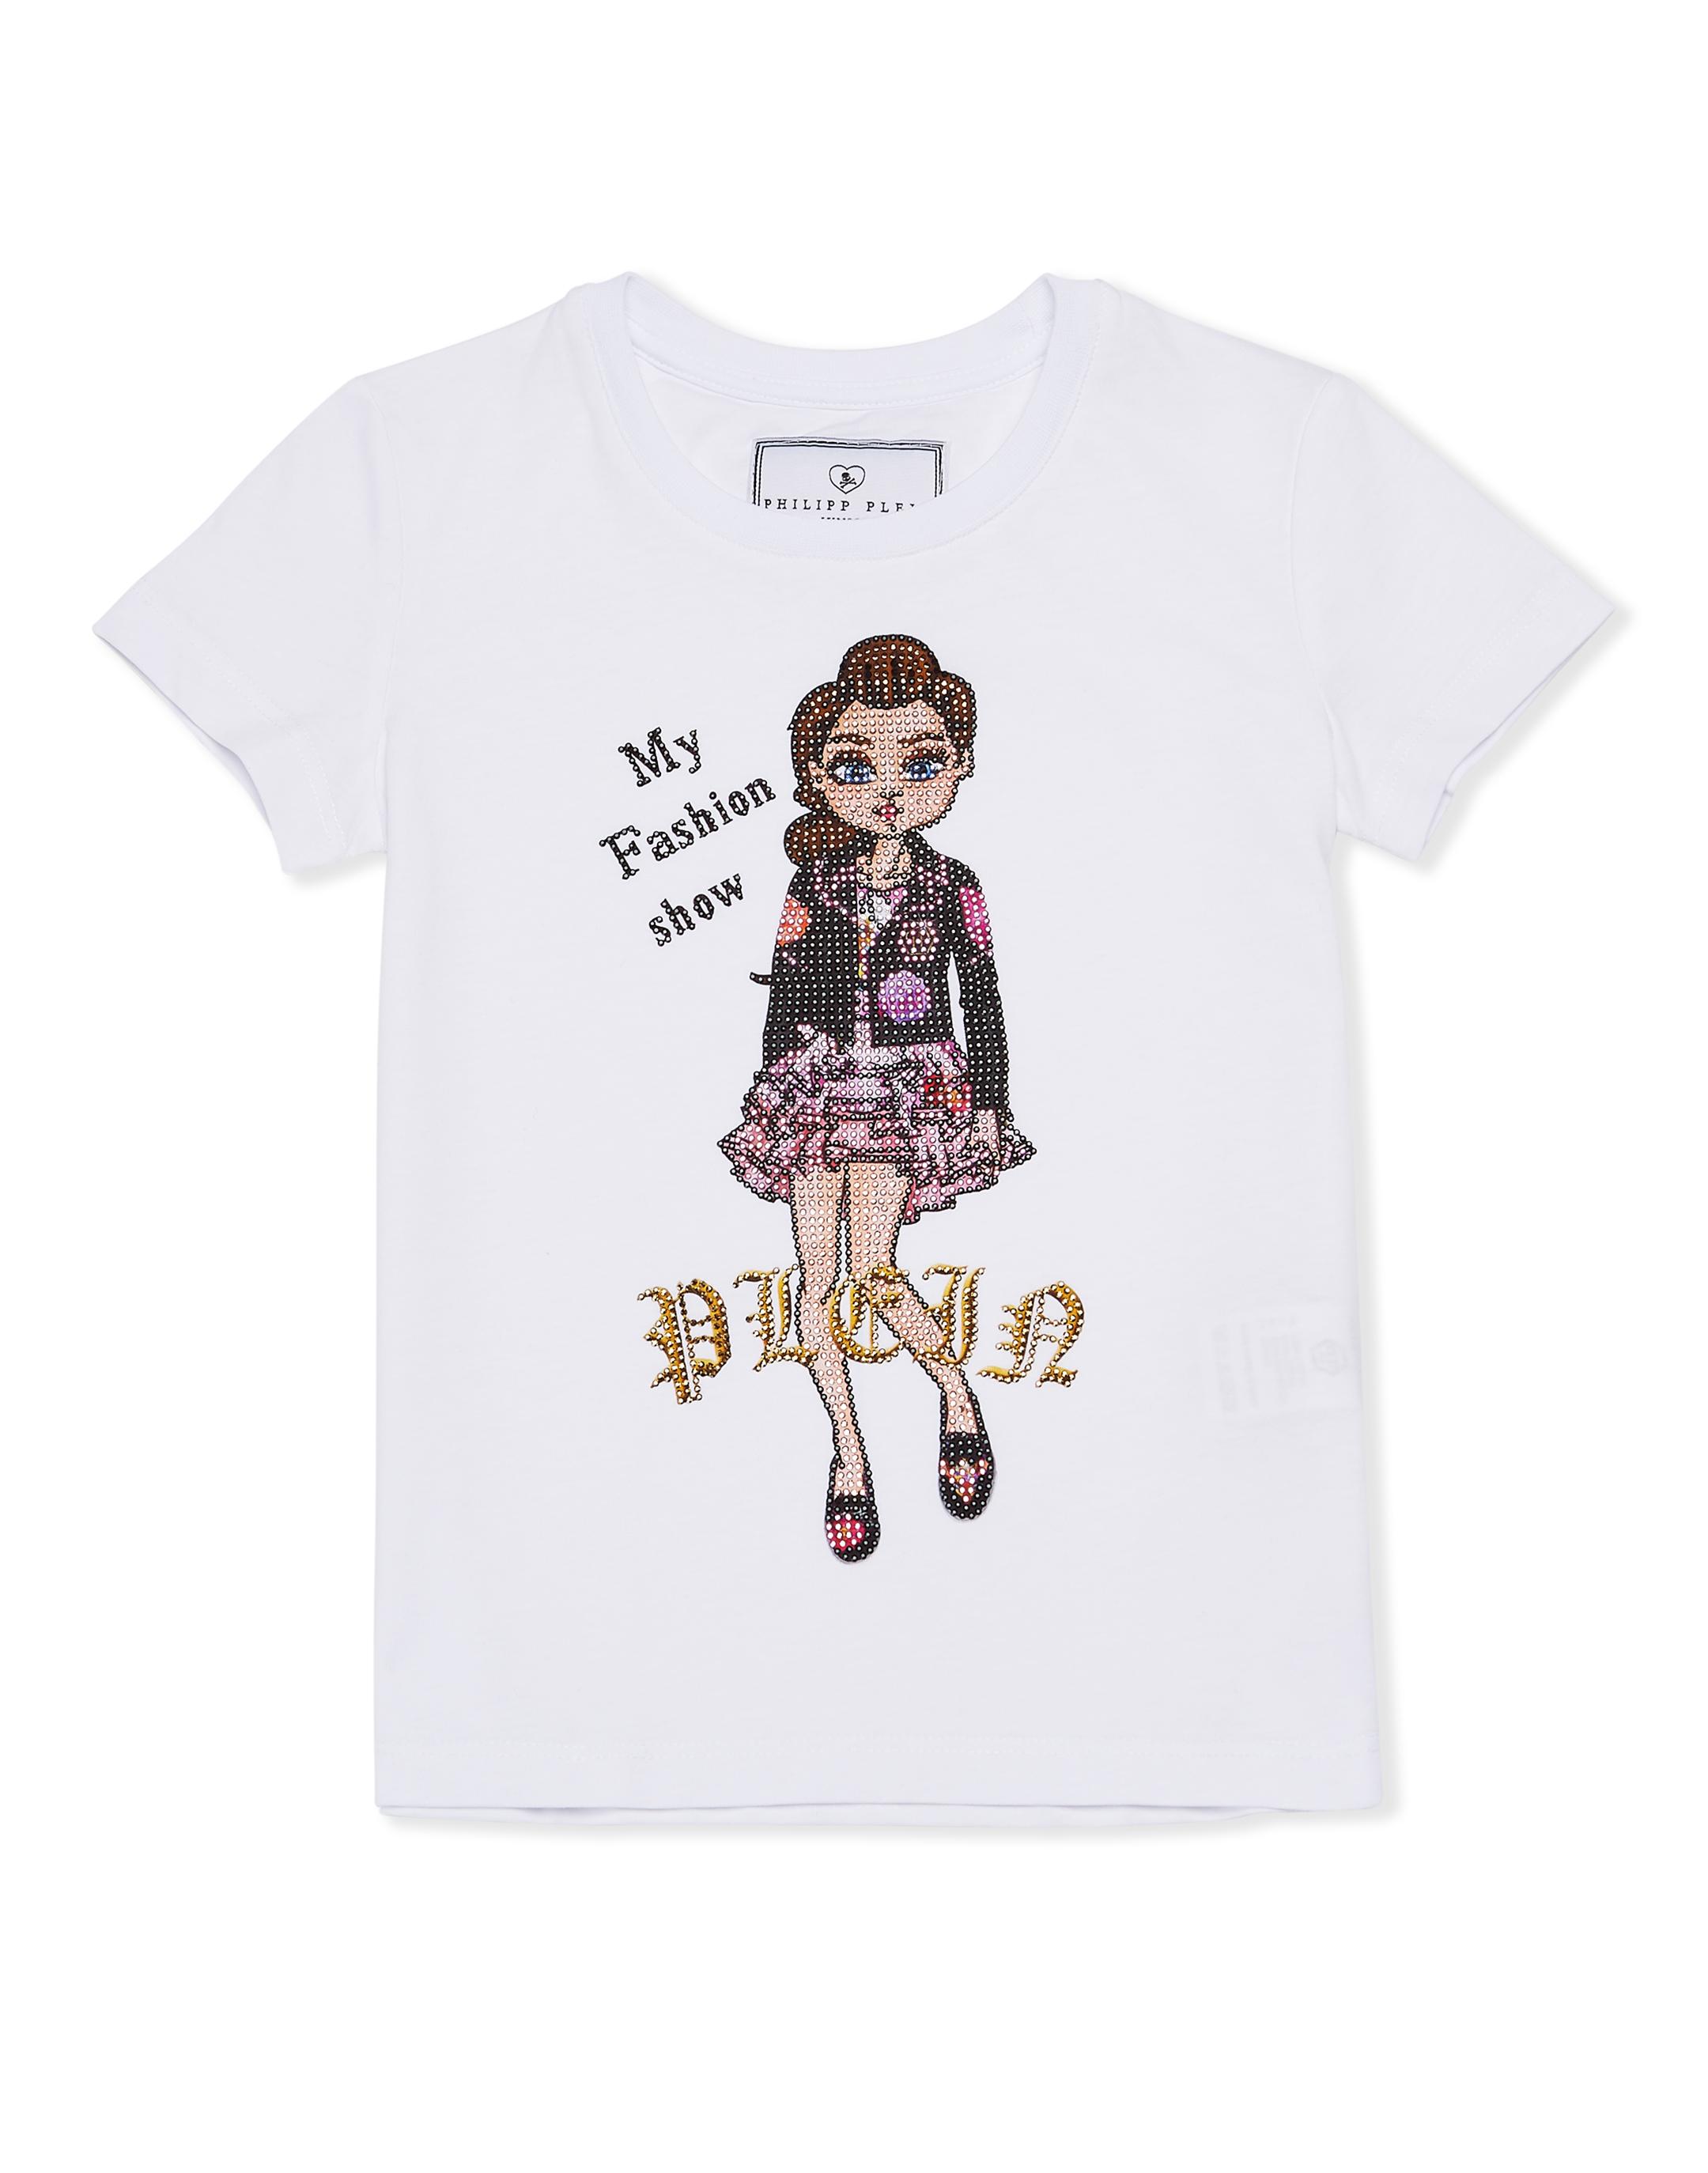 44bb55e98 T-shirt Round Neck SS